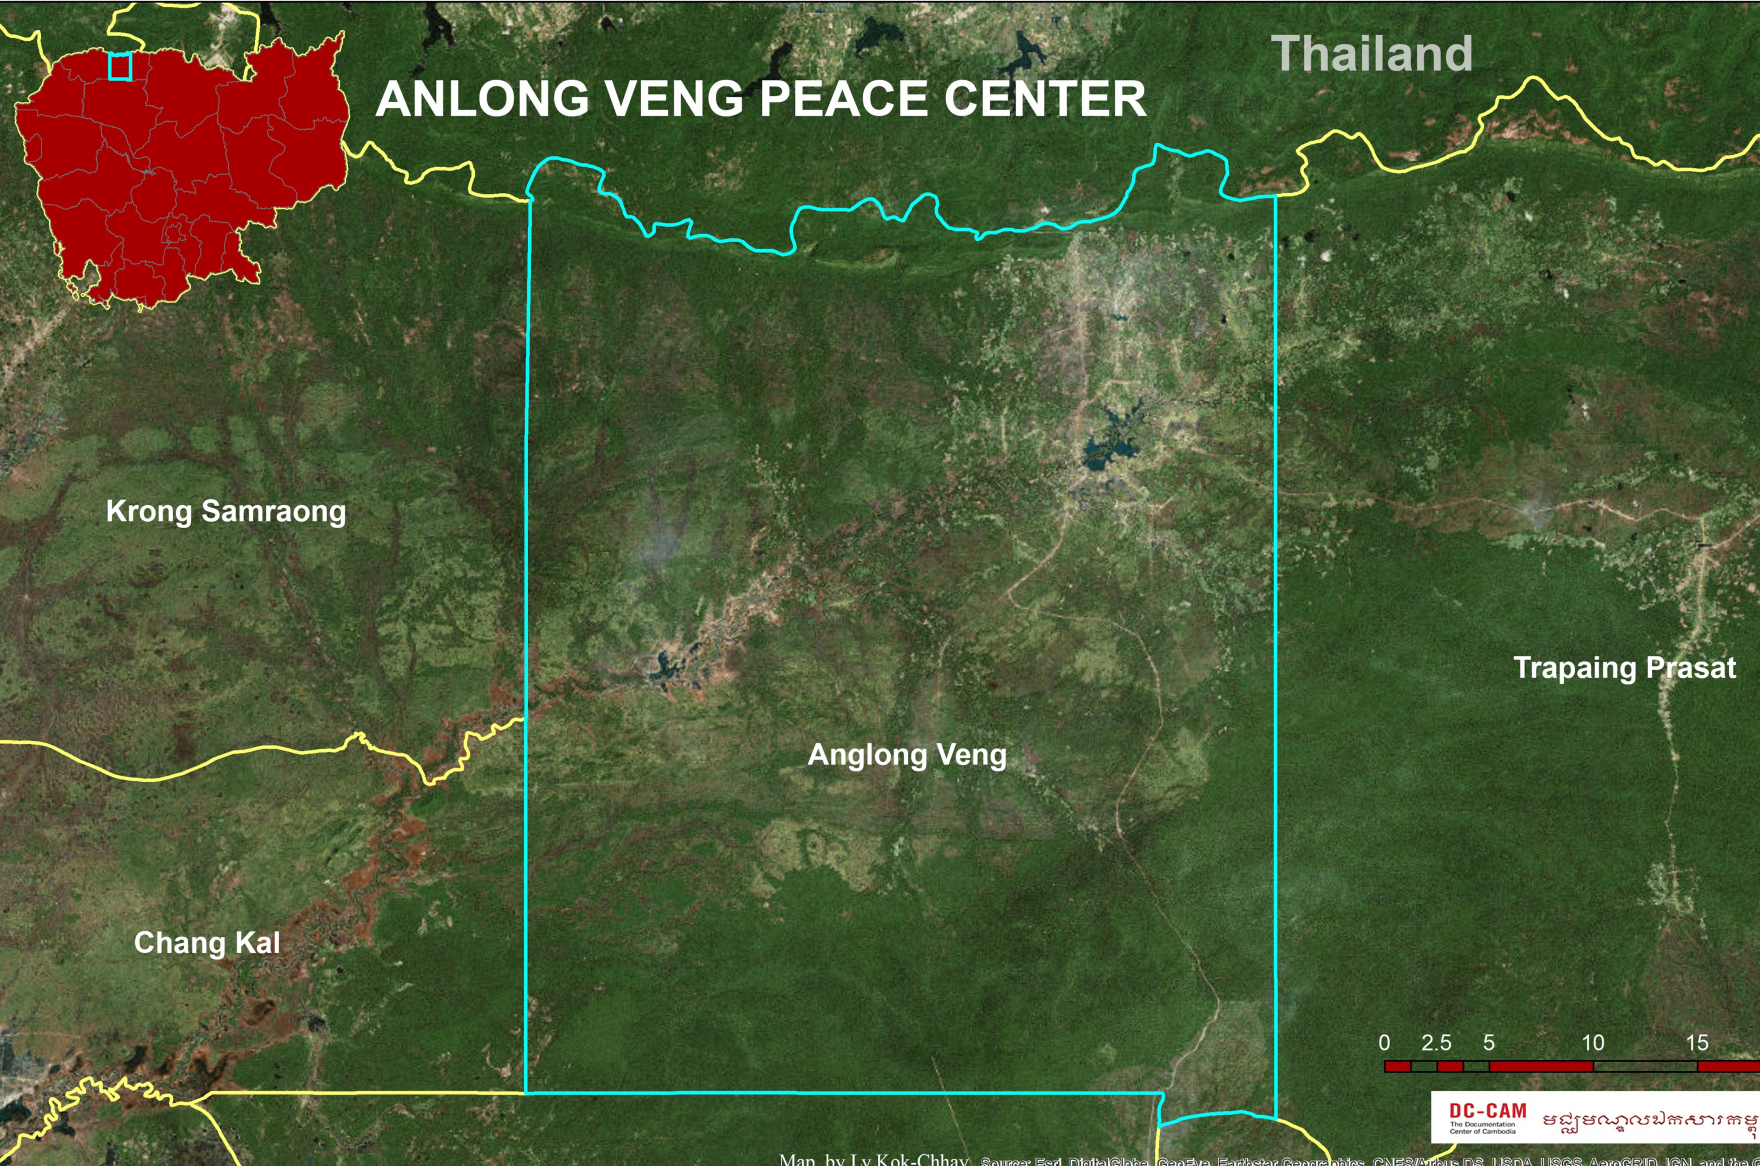 ANLONG VENG PEACE CENTER